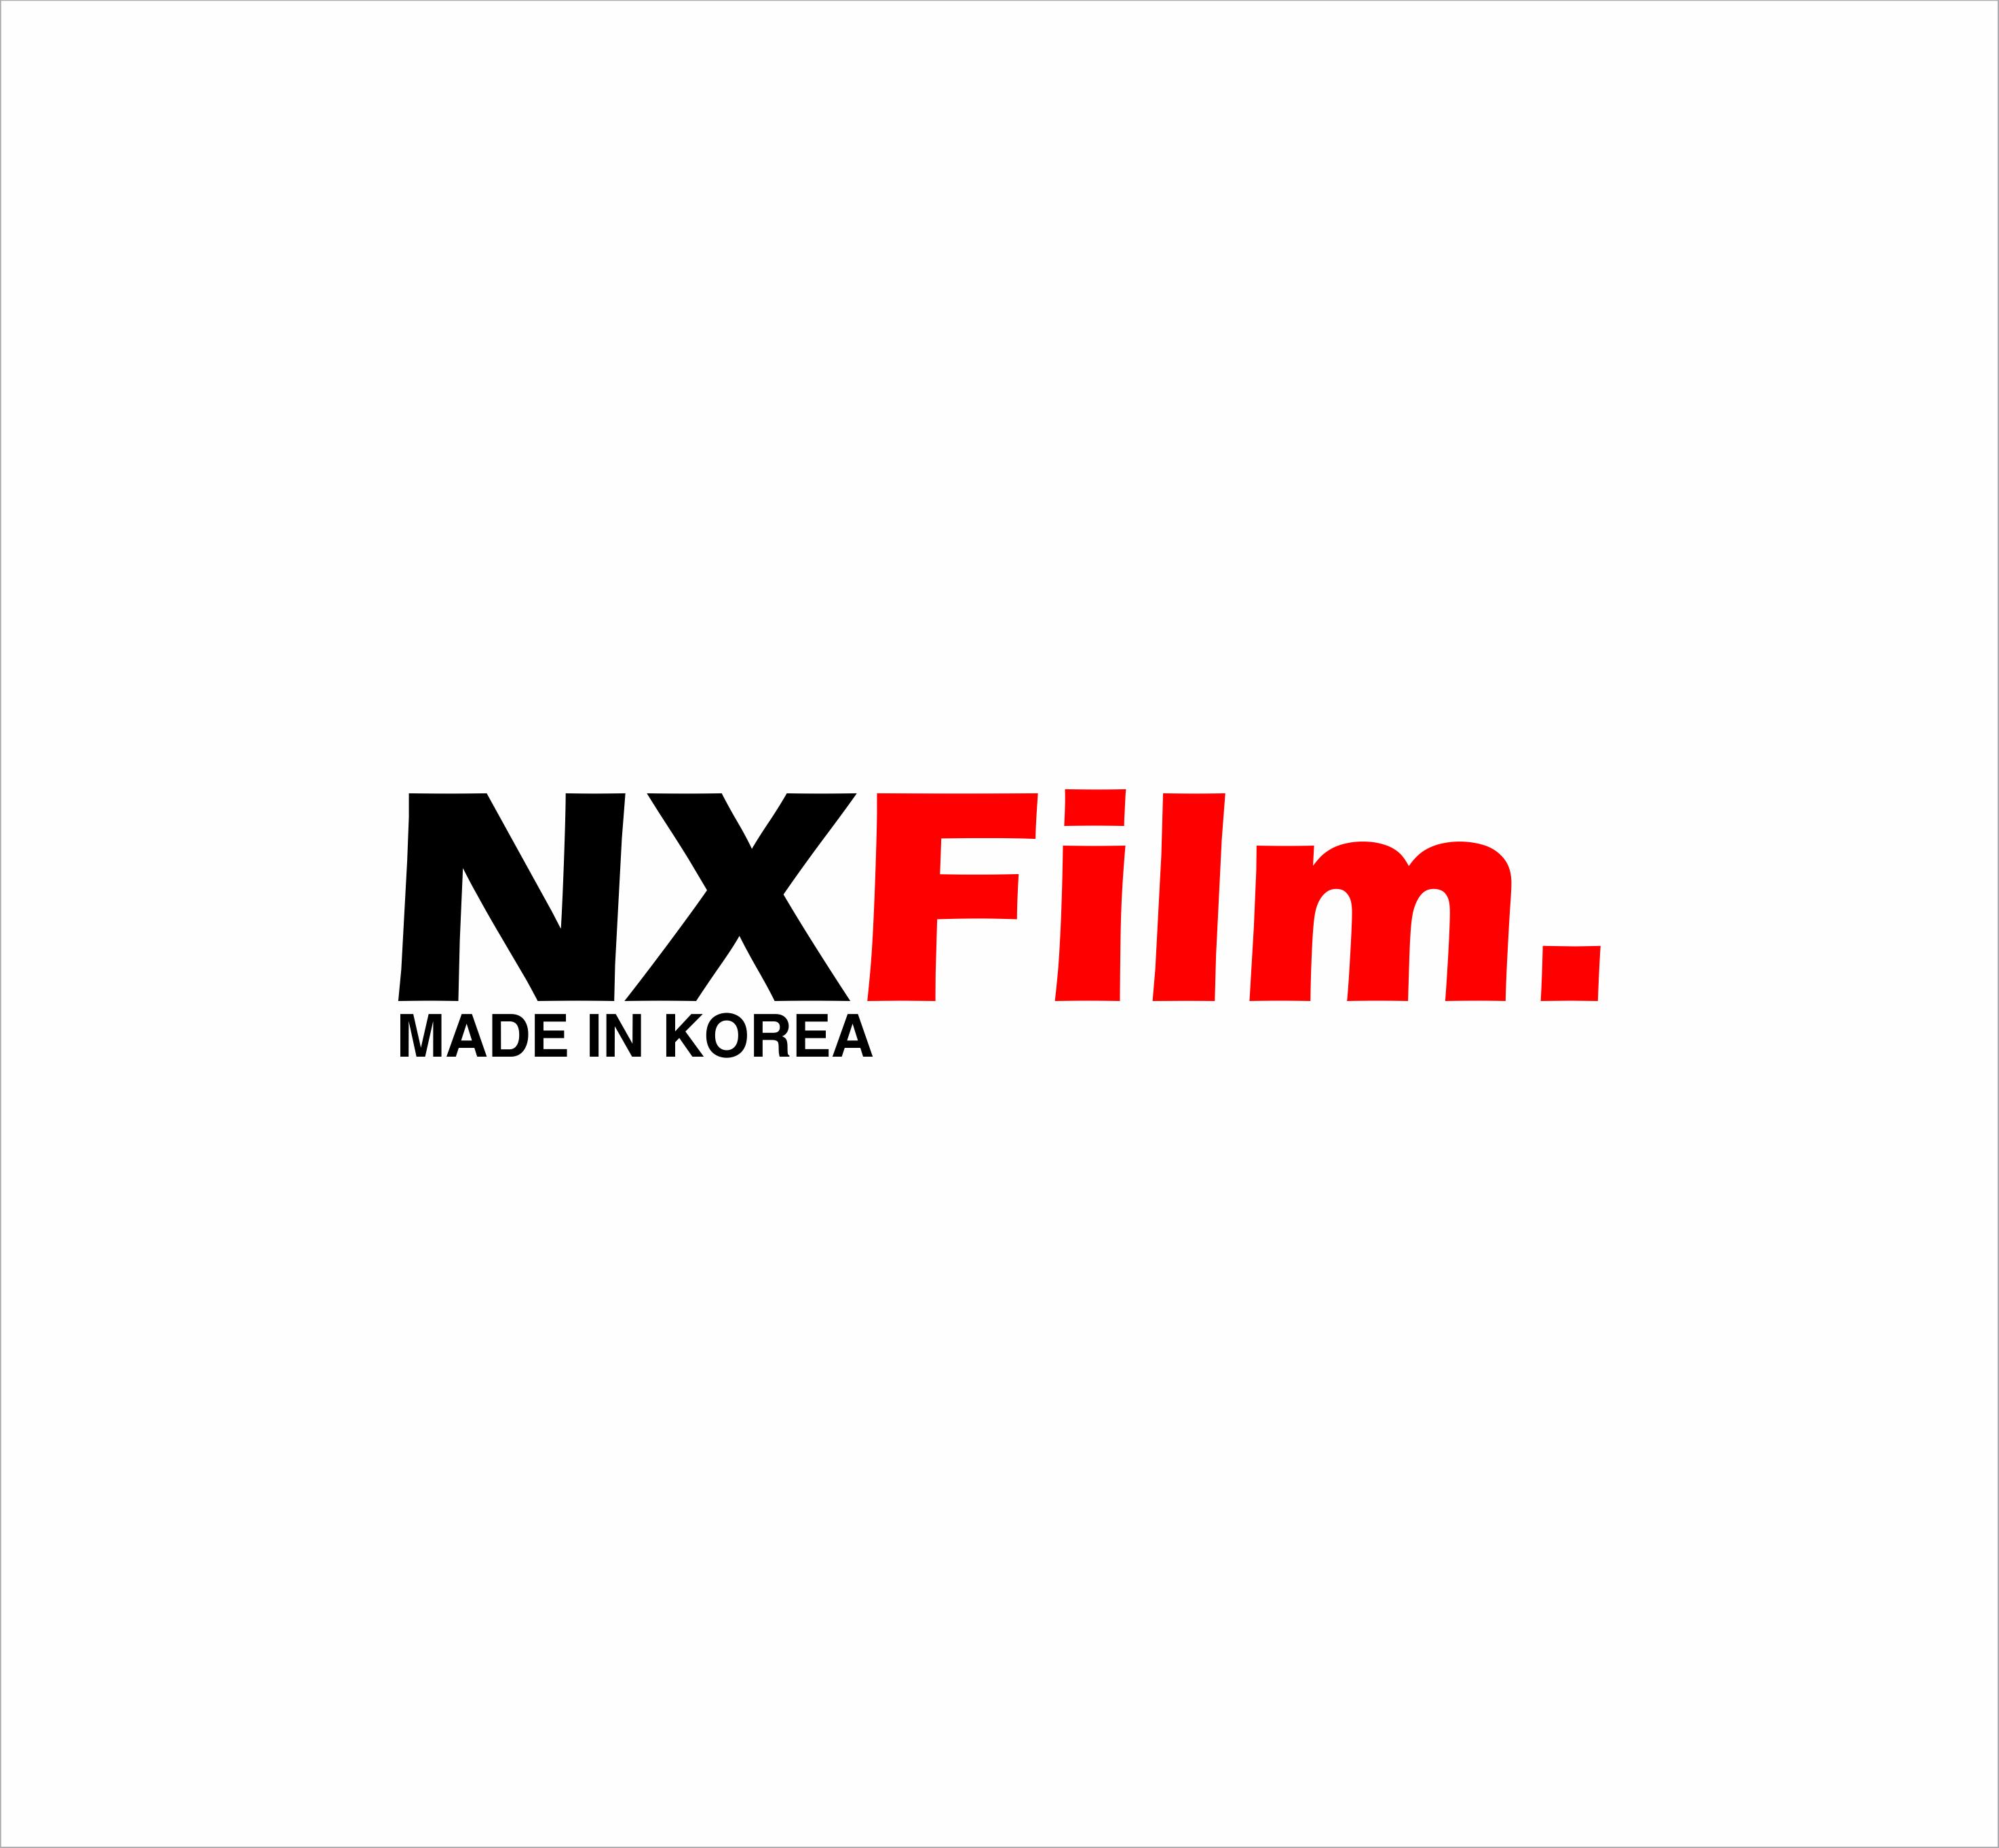 CLEAR 7 MIL NXFILM - COREANA